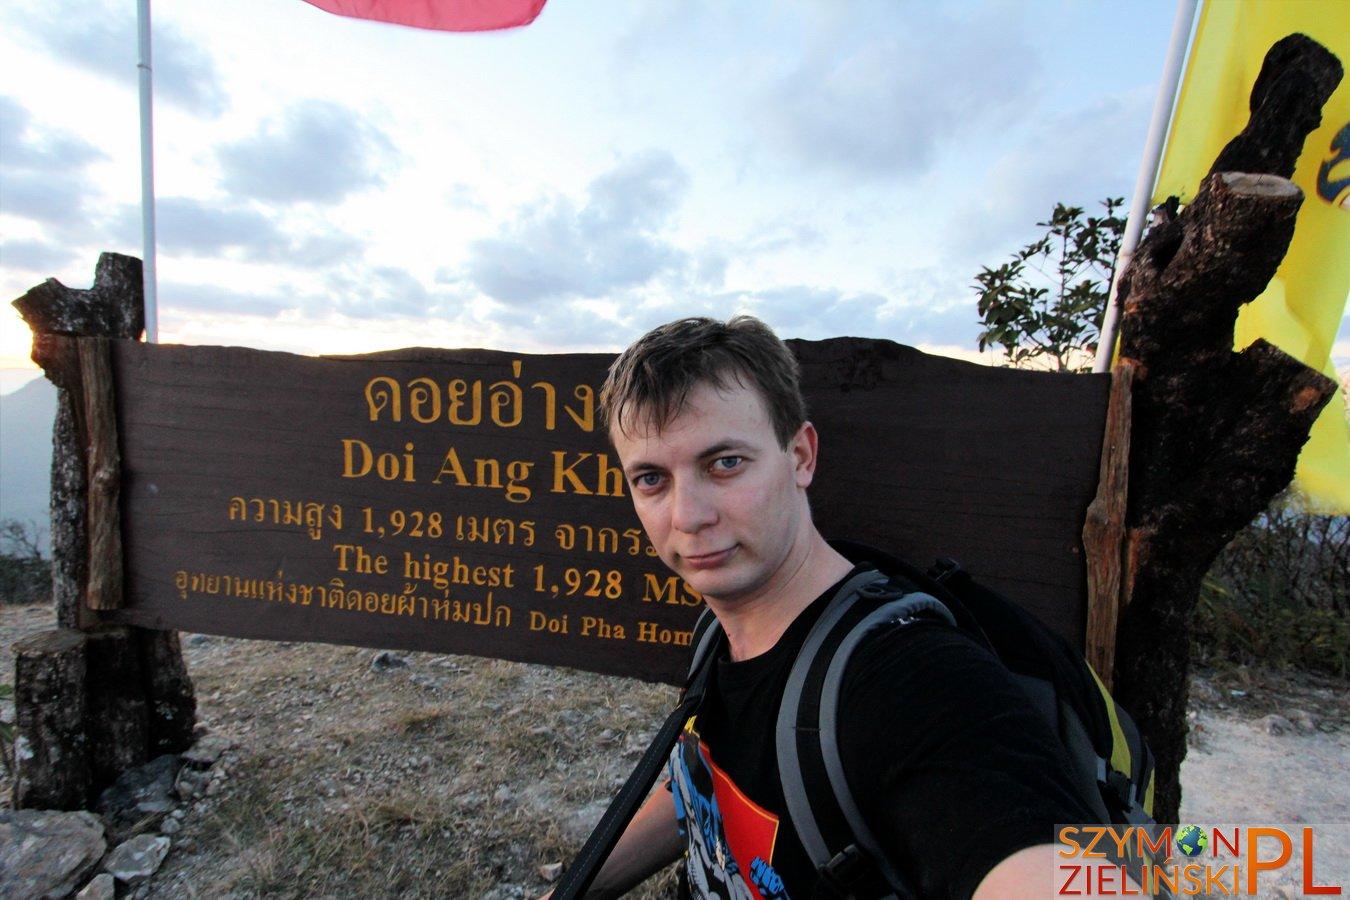 Doi Ang Khang, Chiang Mai province, Thailand